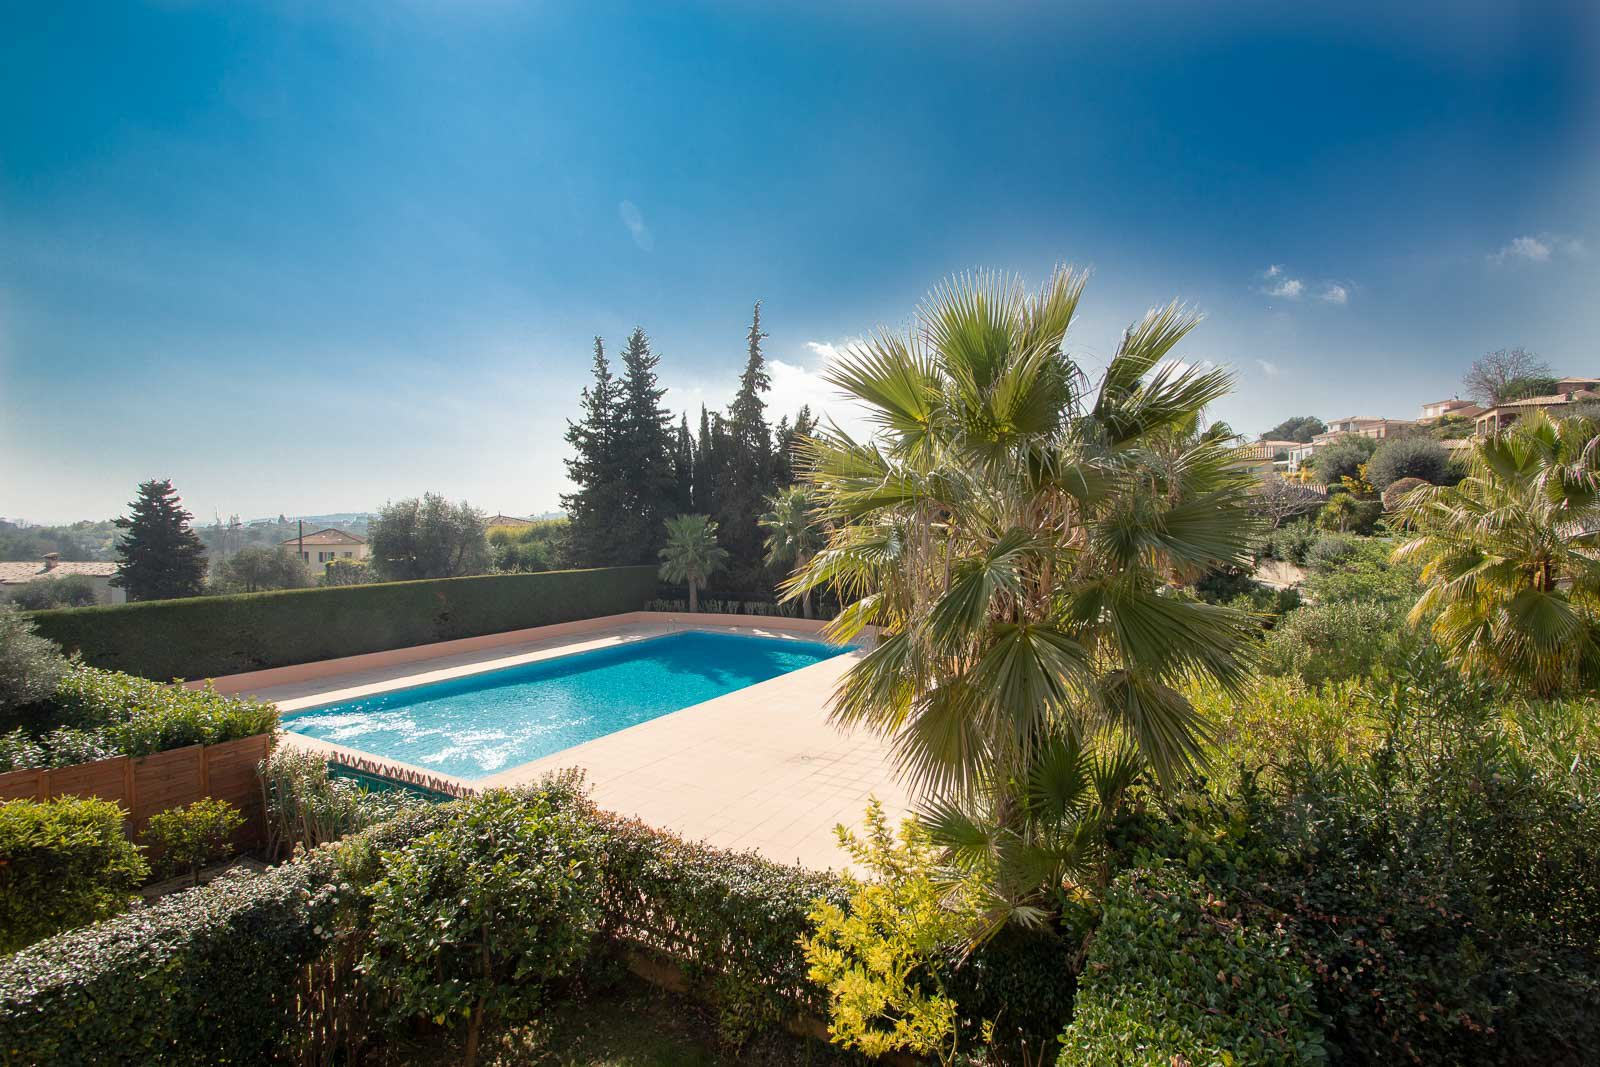 Sulla Costa Azzurra, tra Nizza e Antibes, a Villeneuve Loubet.Questa Casa en una Residenza privata